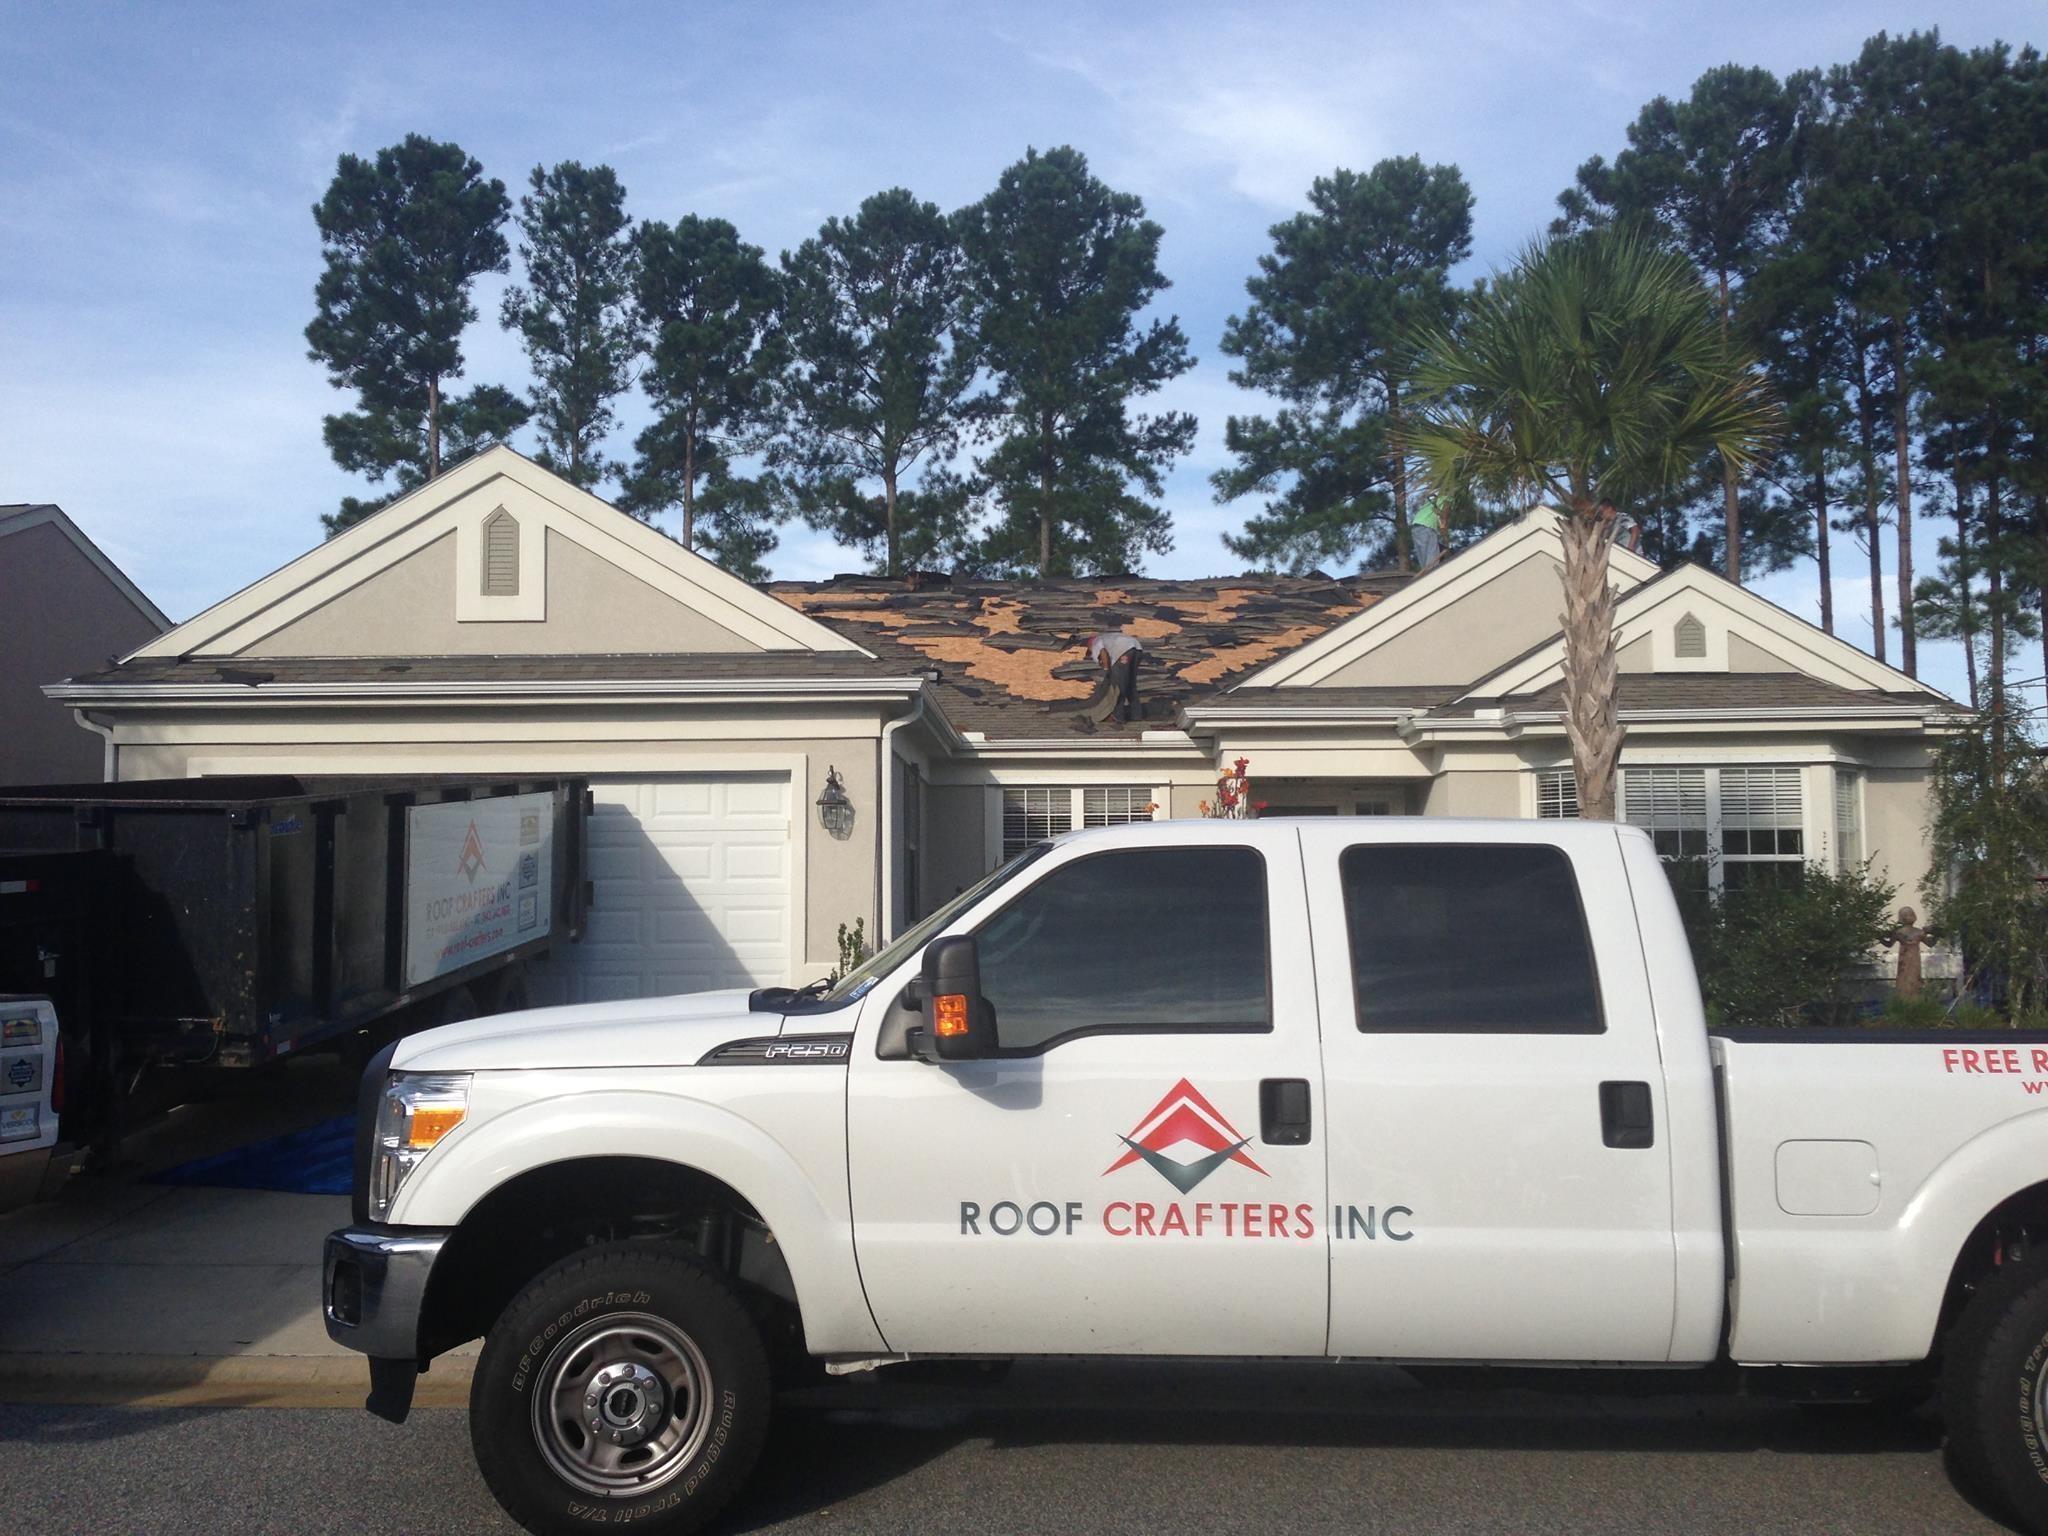 RoofCrafters-Savannah image 10